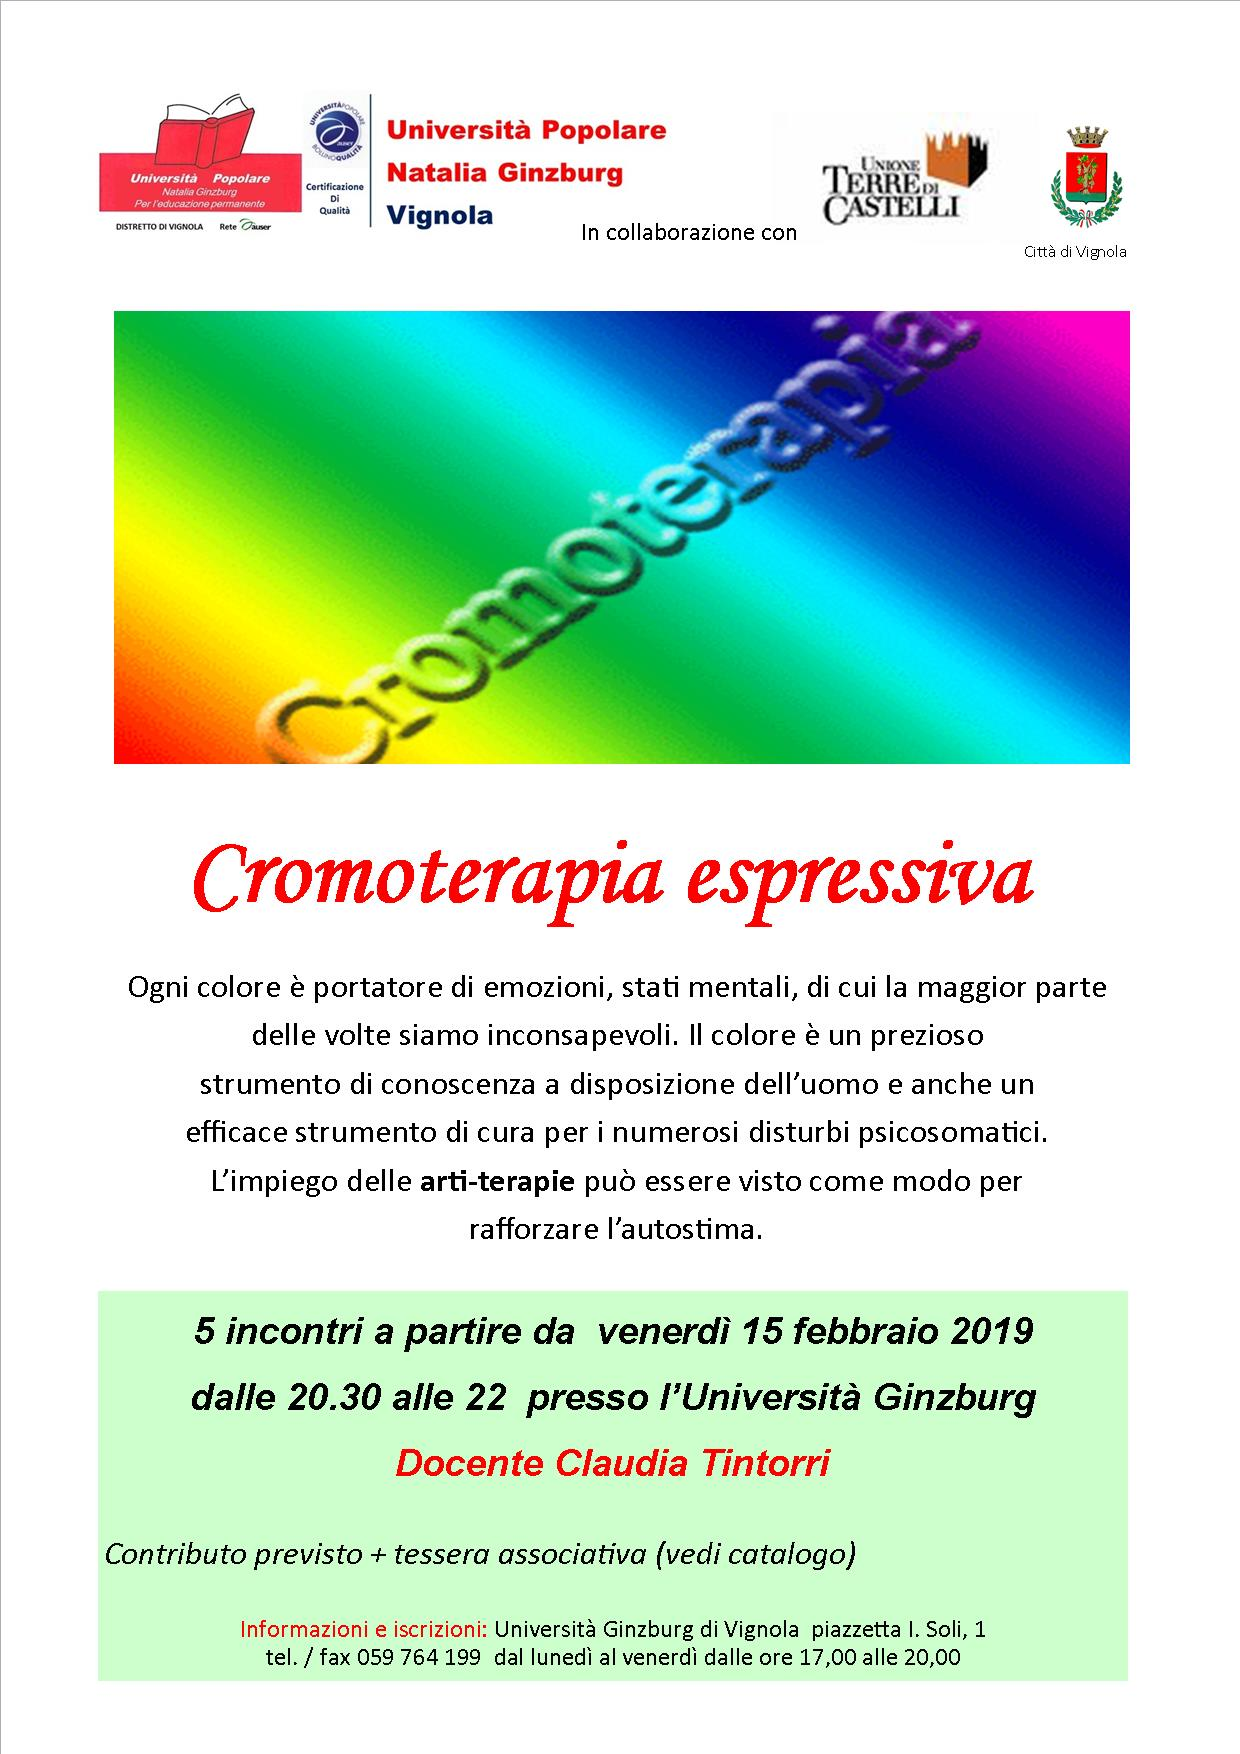 Cromoterapia espressiva